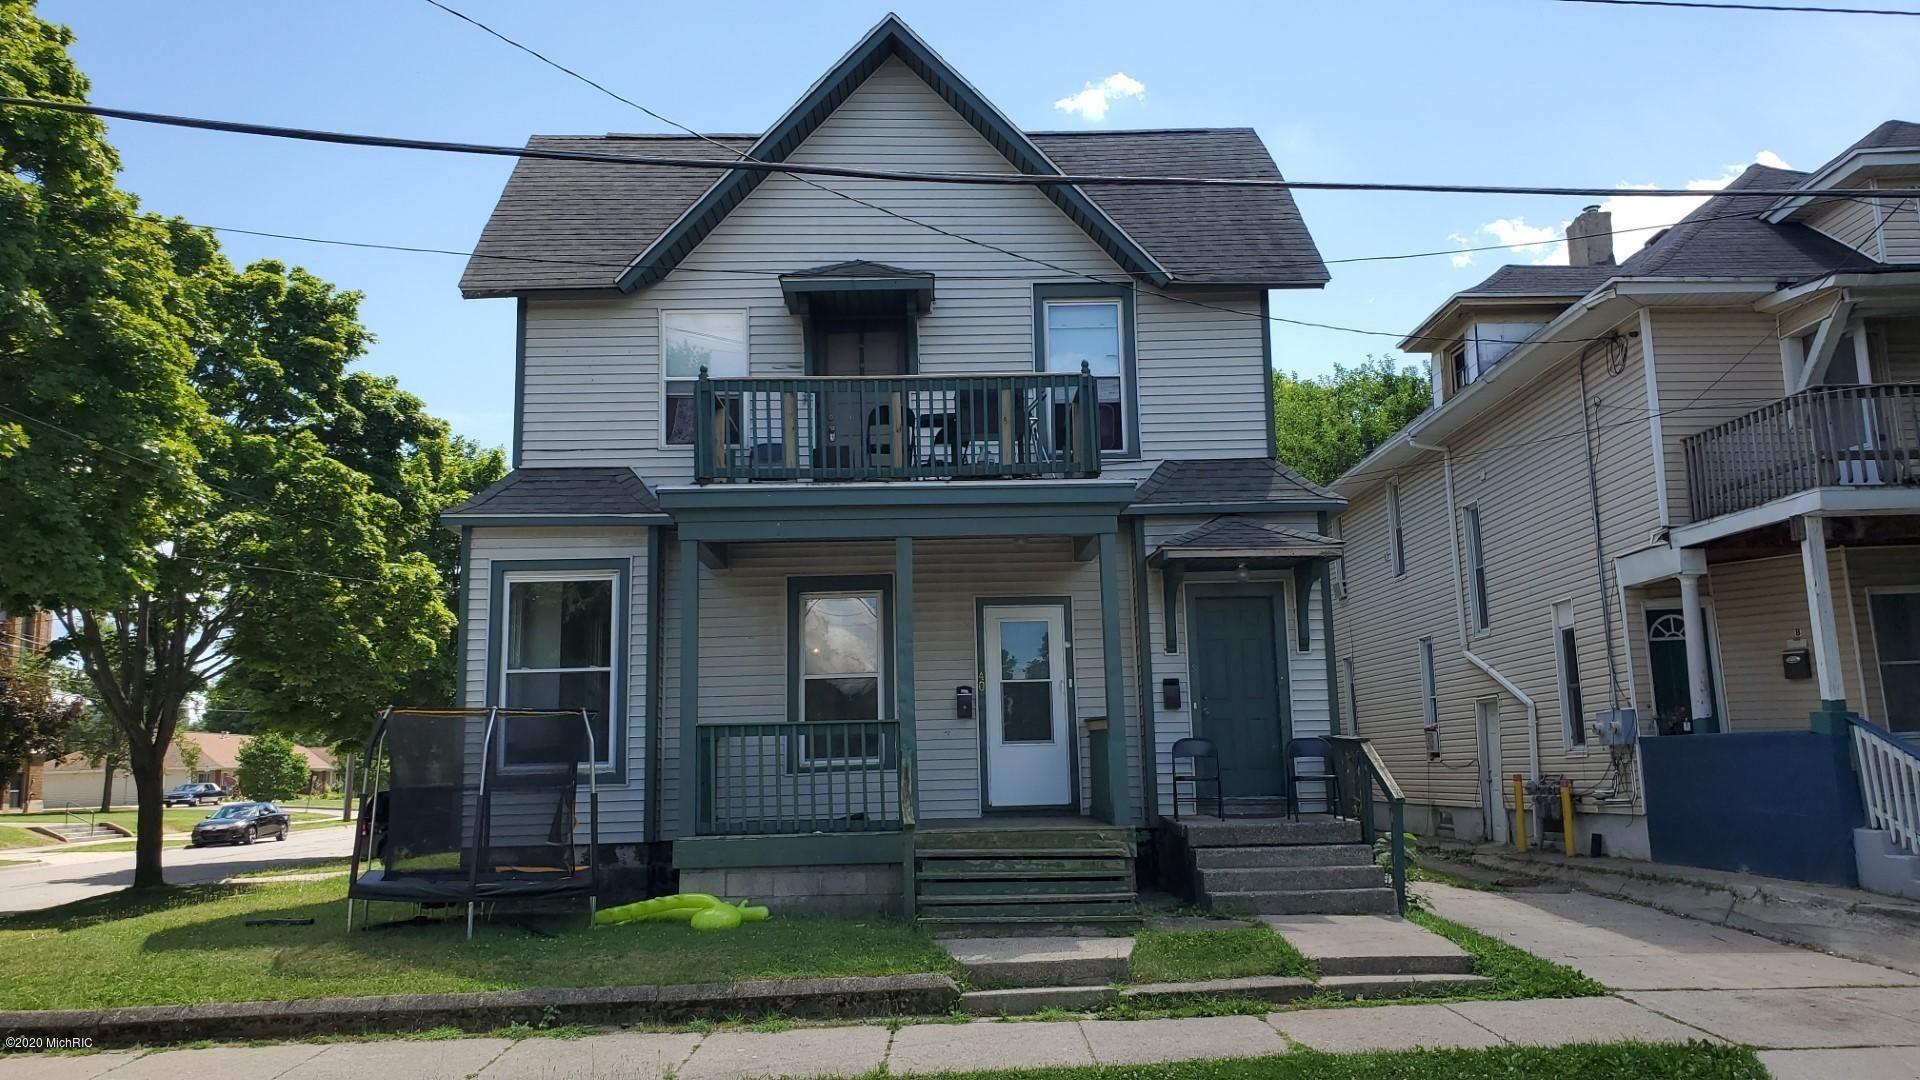 38 Delaware Street SE, Grand Rapids, MI 49507 - MLS#: 20038244